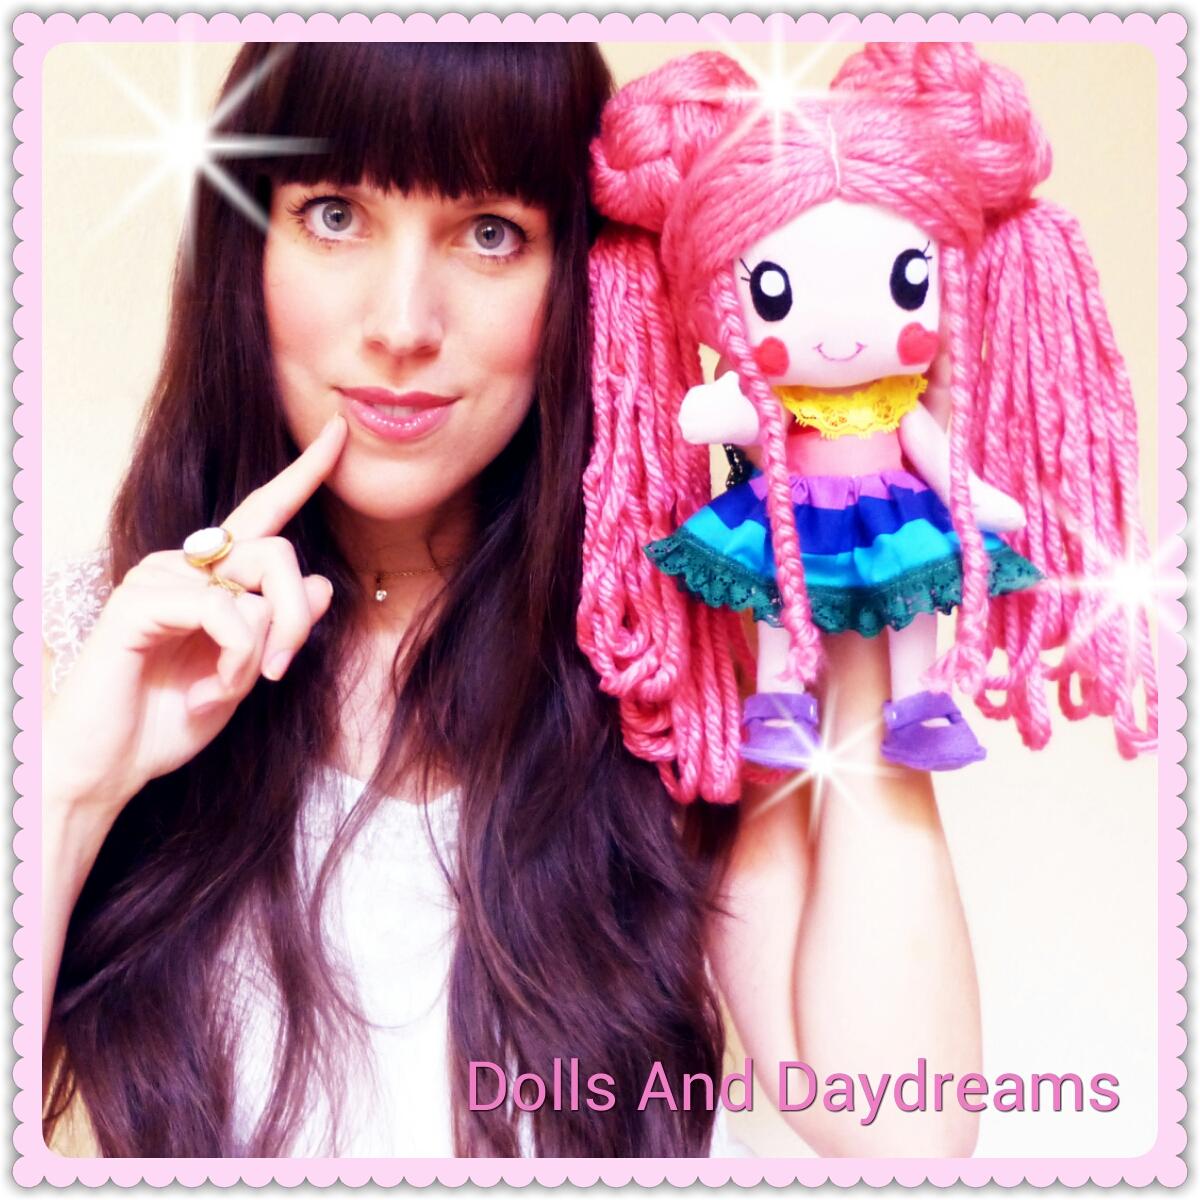 kawaii doll rainbow baby cute